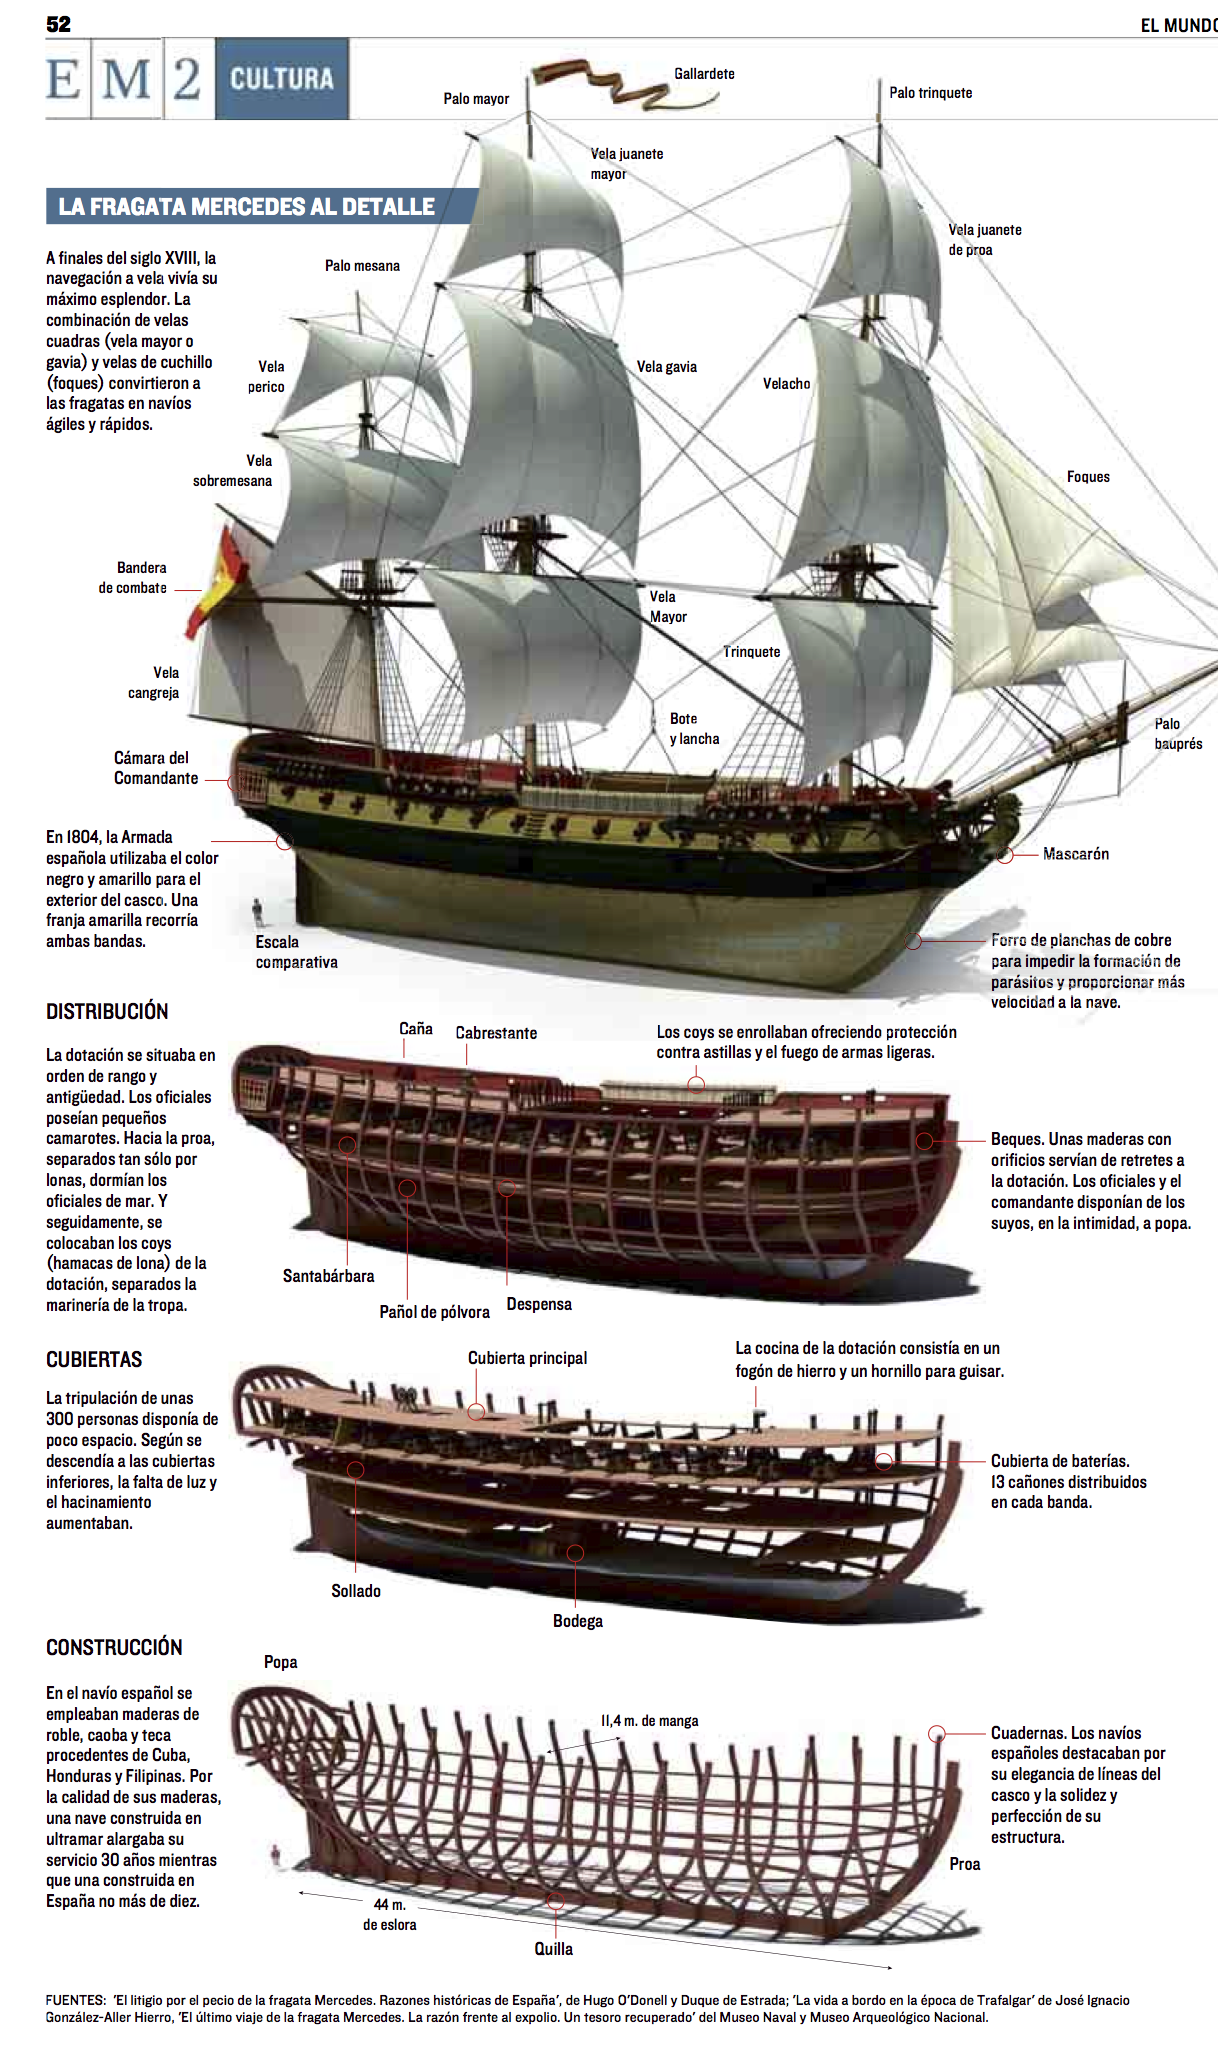 Parts Of A Pirate Ship Diagram Rj45 Wall Socket Wiring Australia Fragata Merced El Mundo Sailing Ships Pinterest